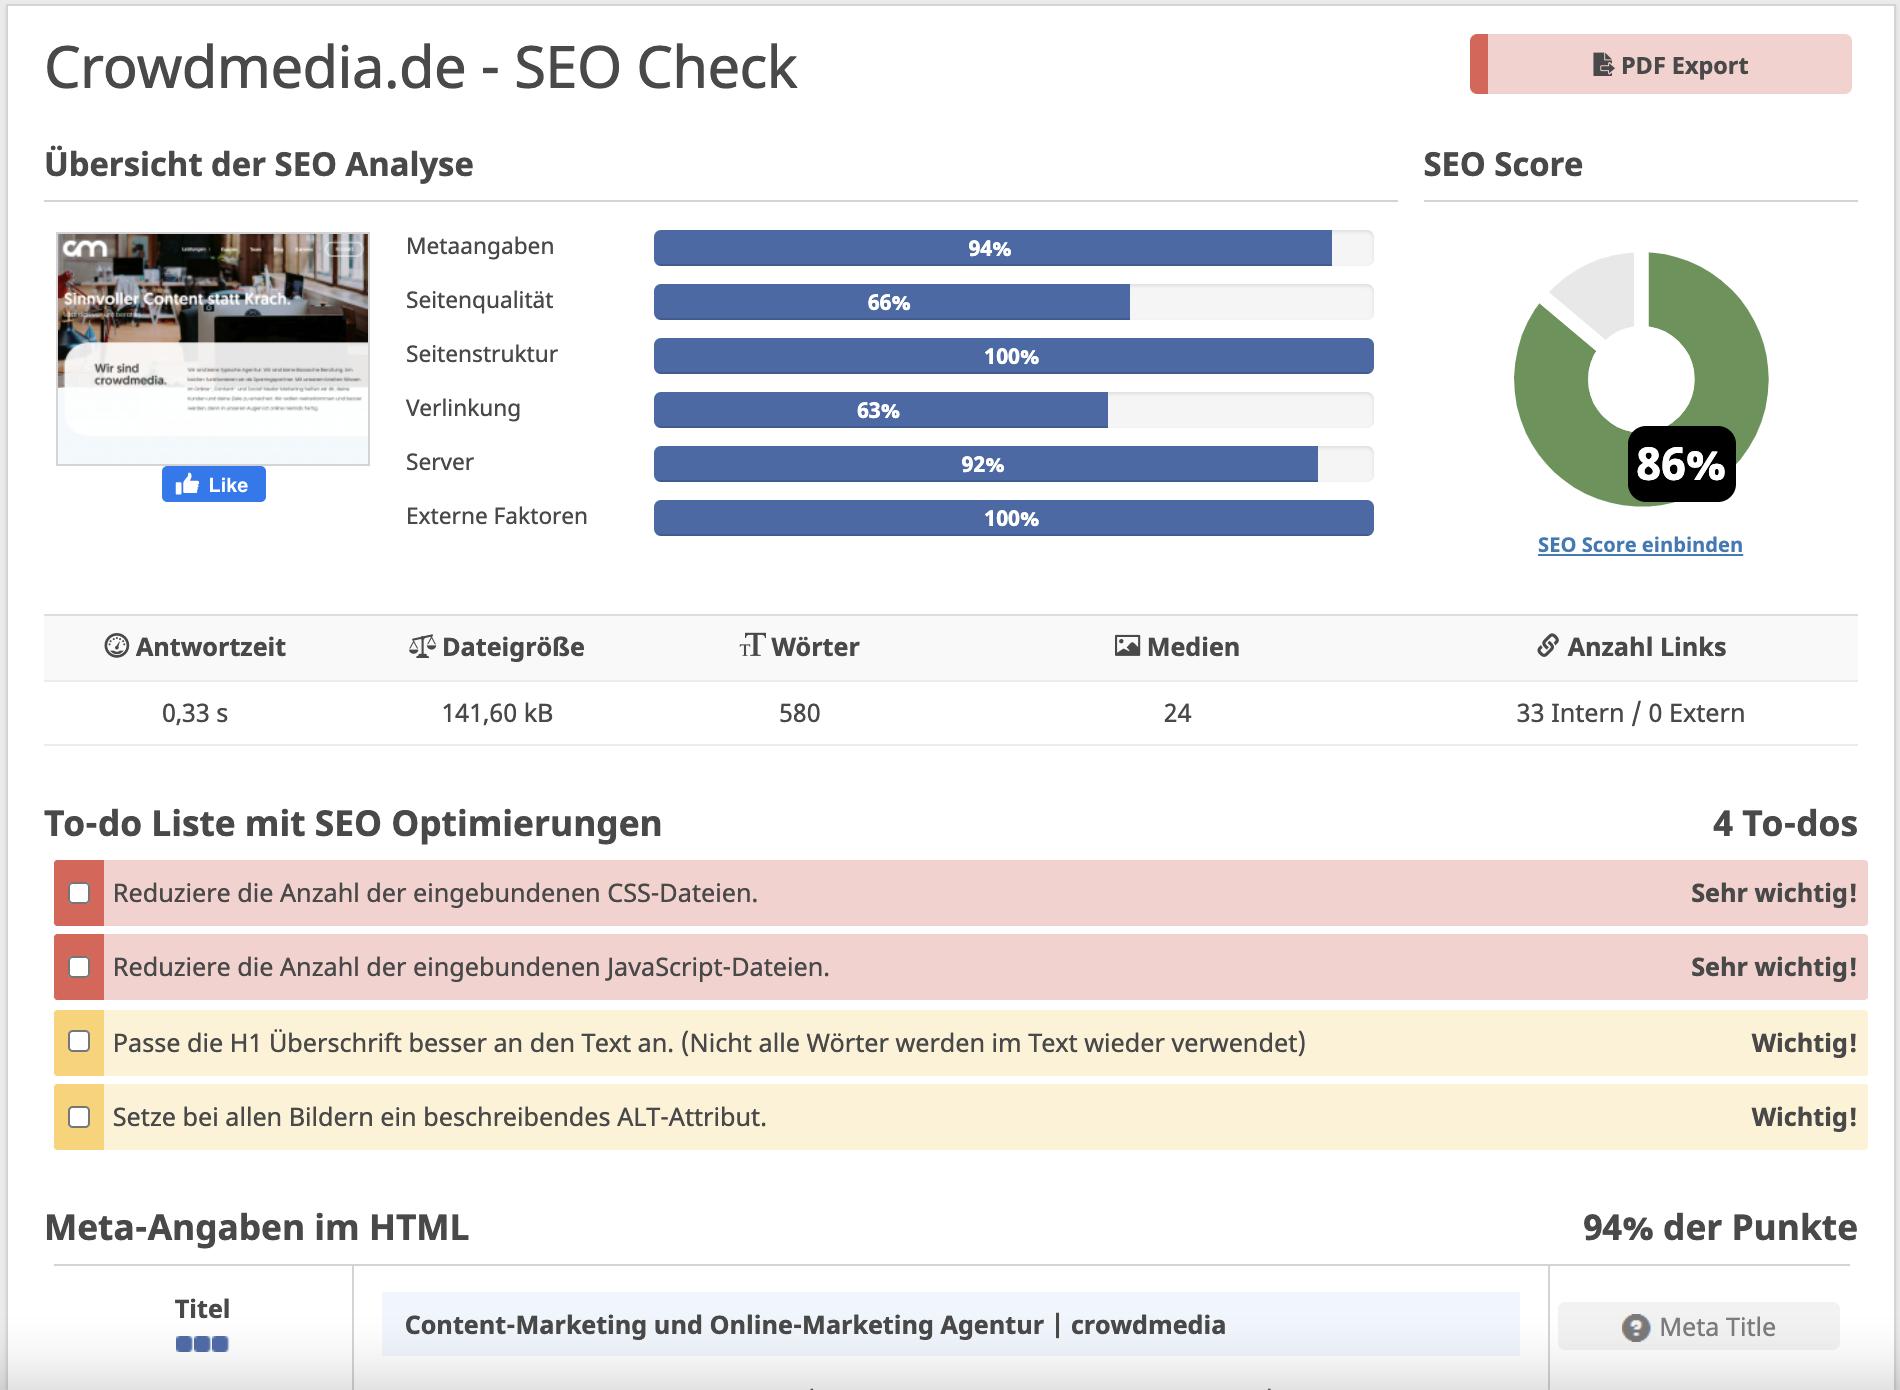 Kostenlose SEO-Tools: Seobility SEO Check